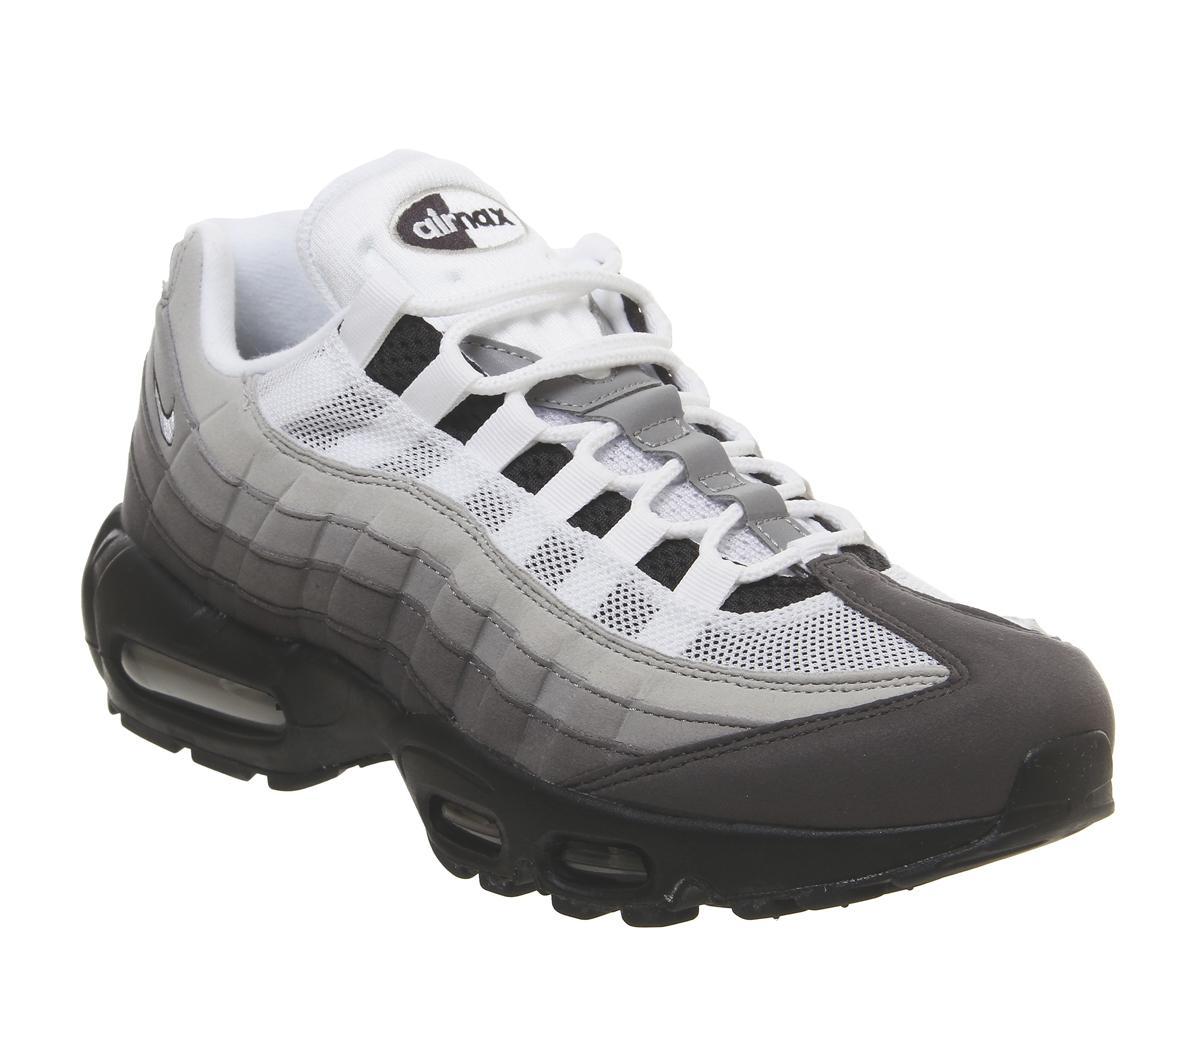 Nike Air Max 95 Trainers Black White